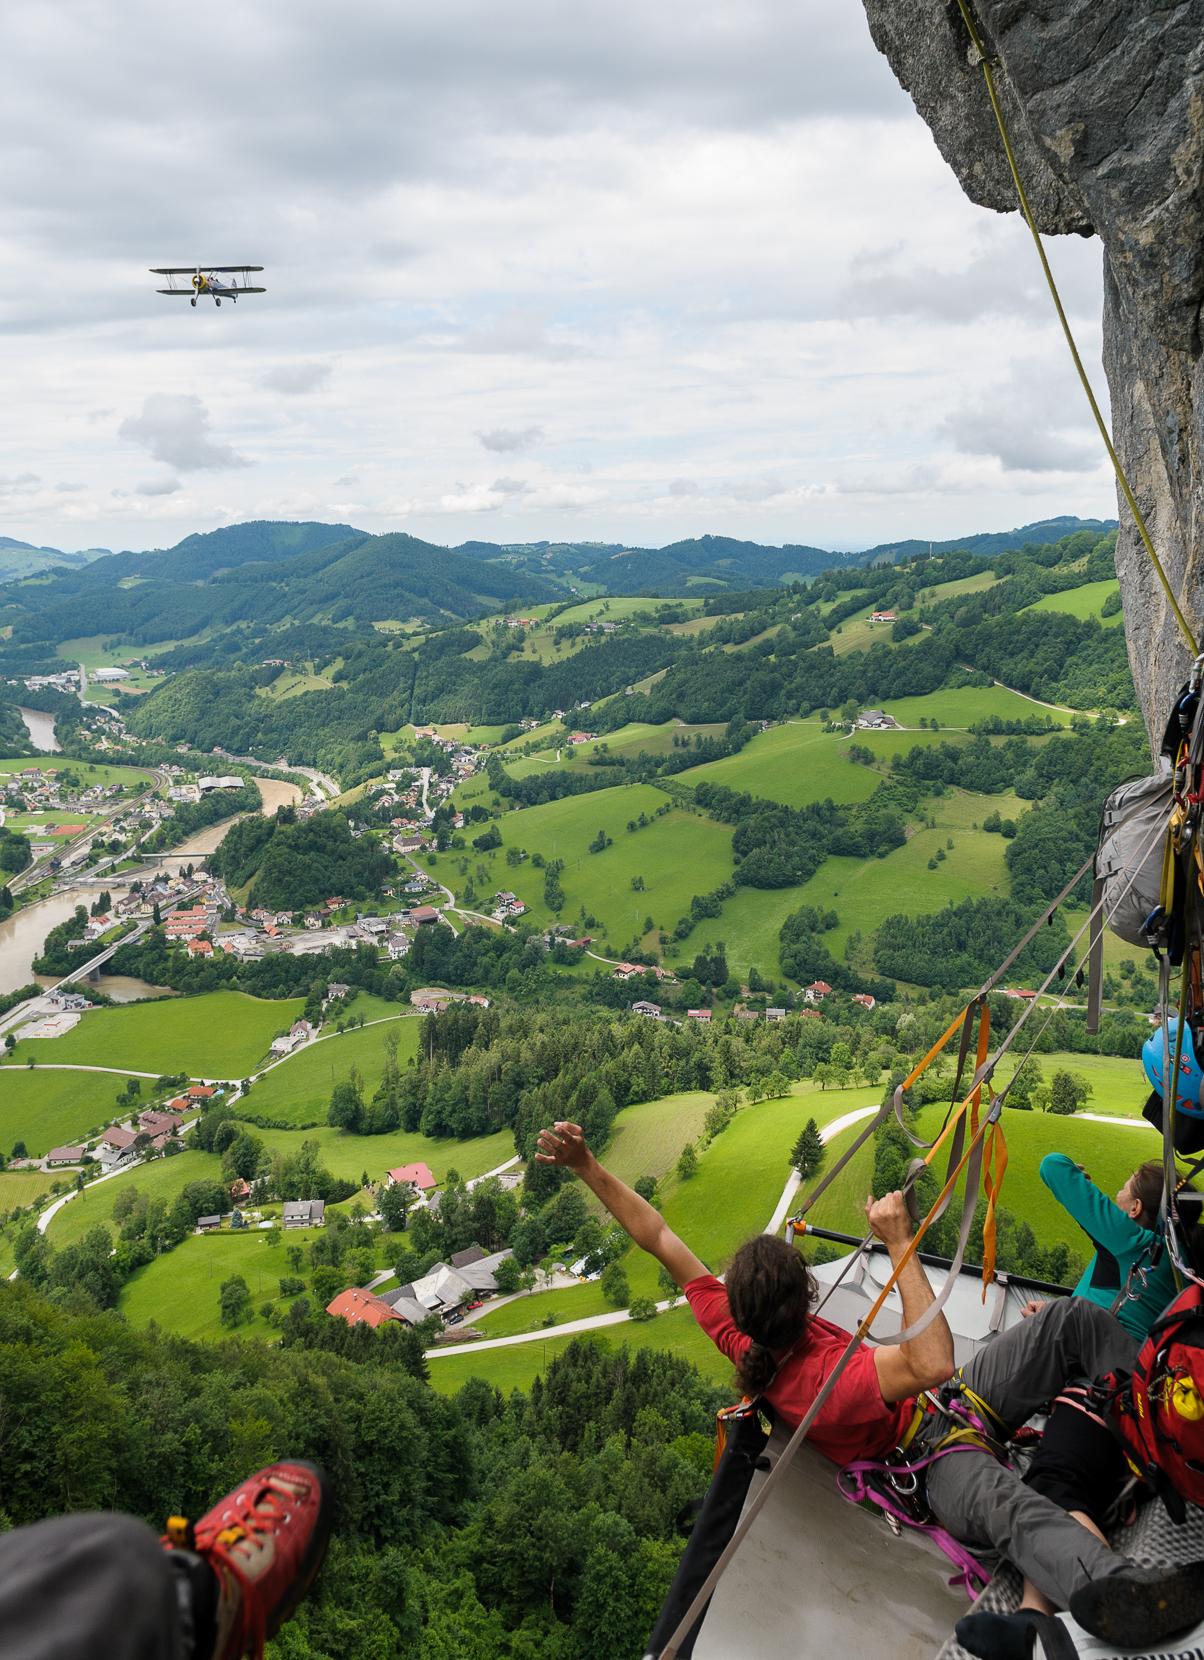 climbing, klettern, Biwak